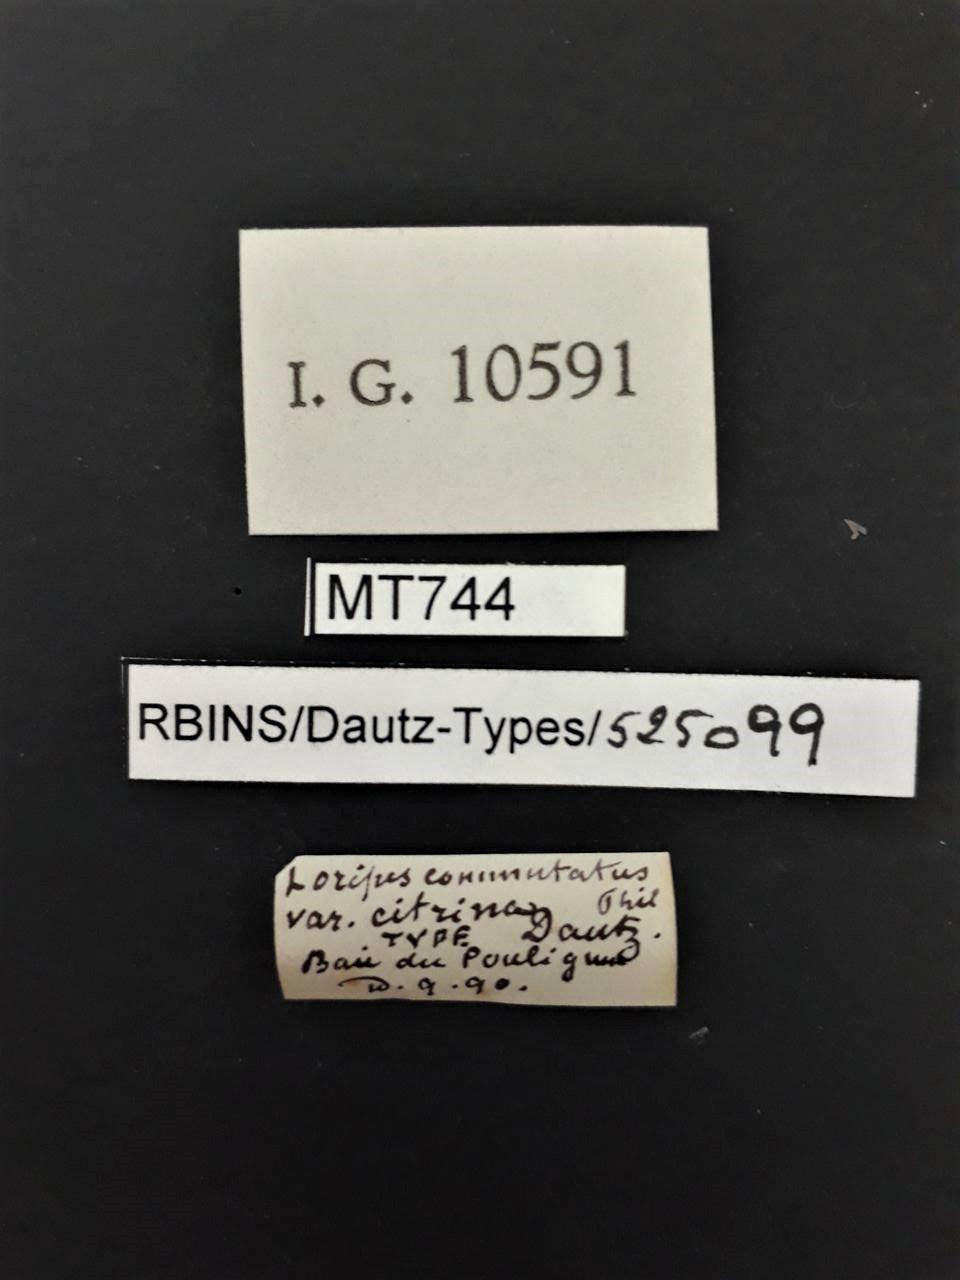 BE-RBINS-INV MT 744 Loripes commutatus var. cintrina t Lb.jpg